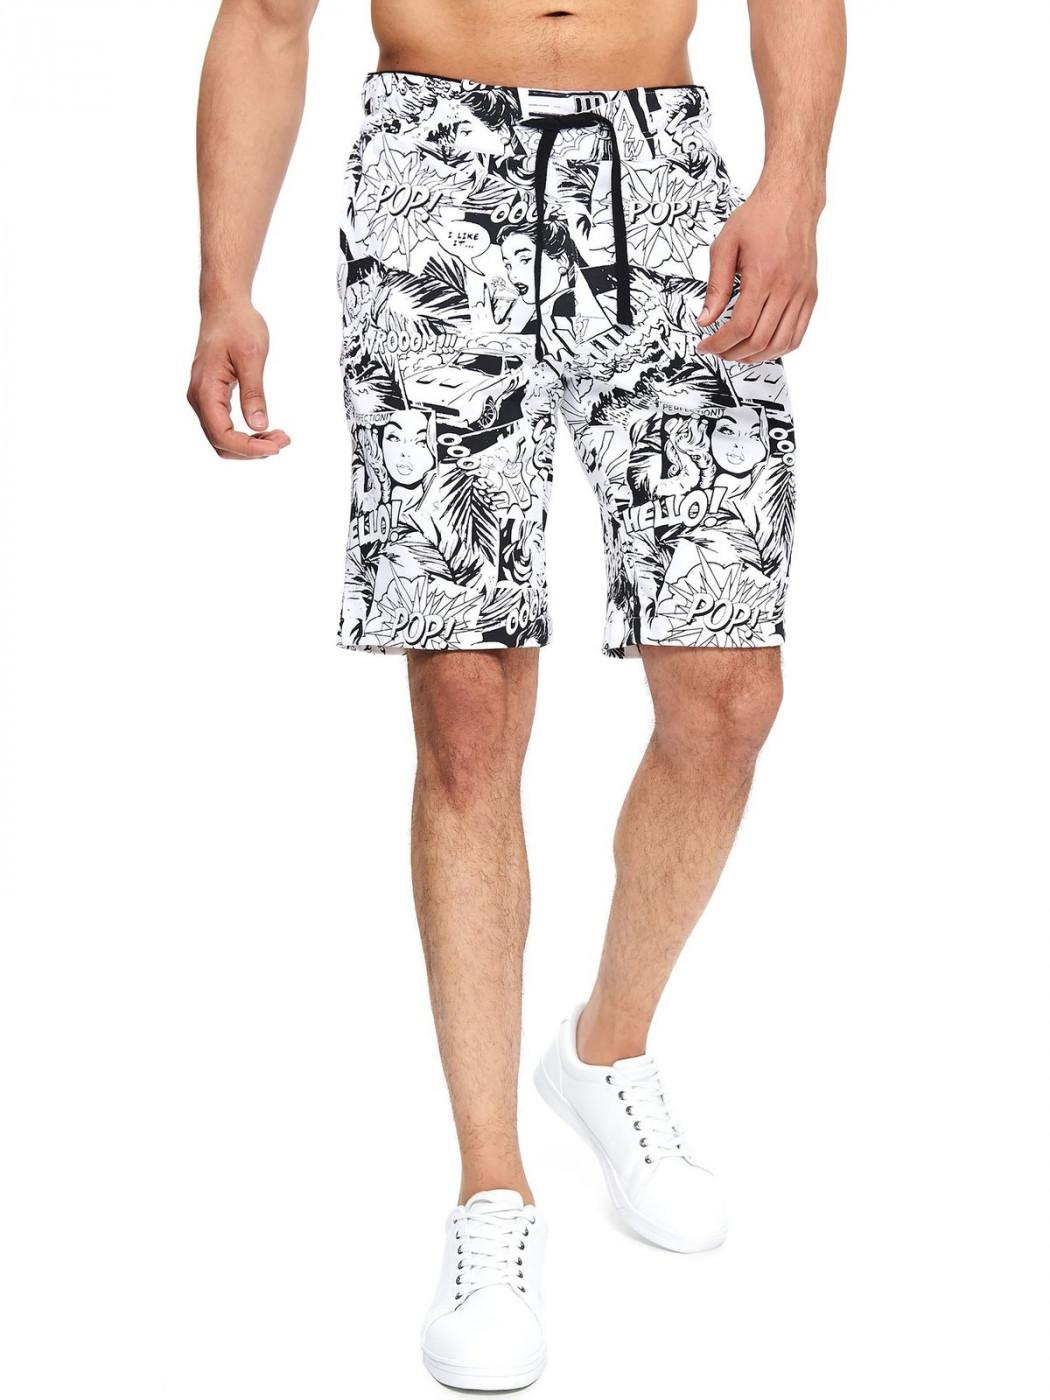 Men's shorts Top Secret Comics patterned